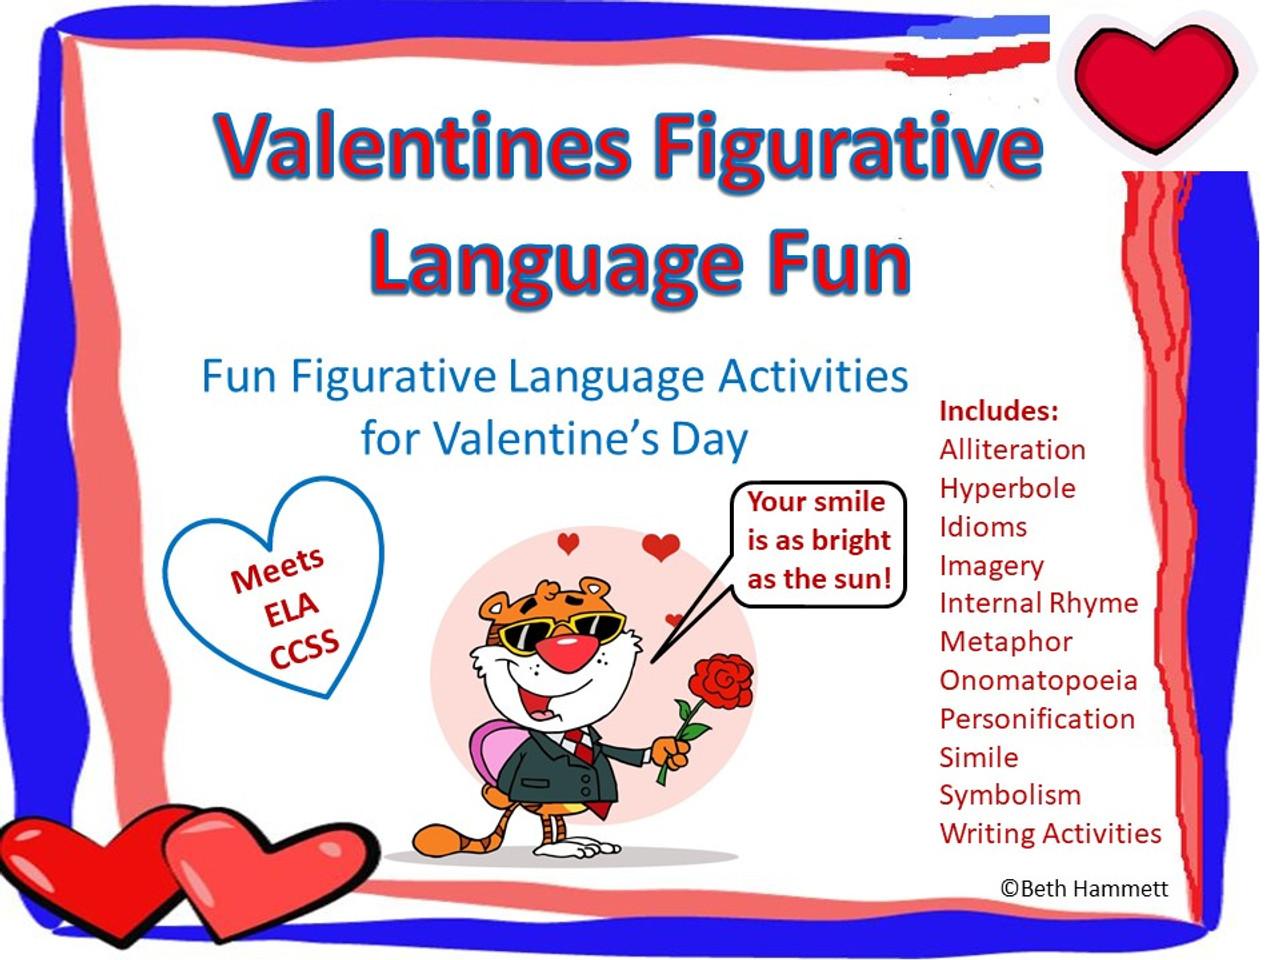 Valentine's Day Figurative Language Fun